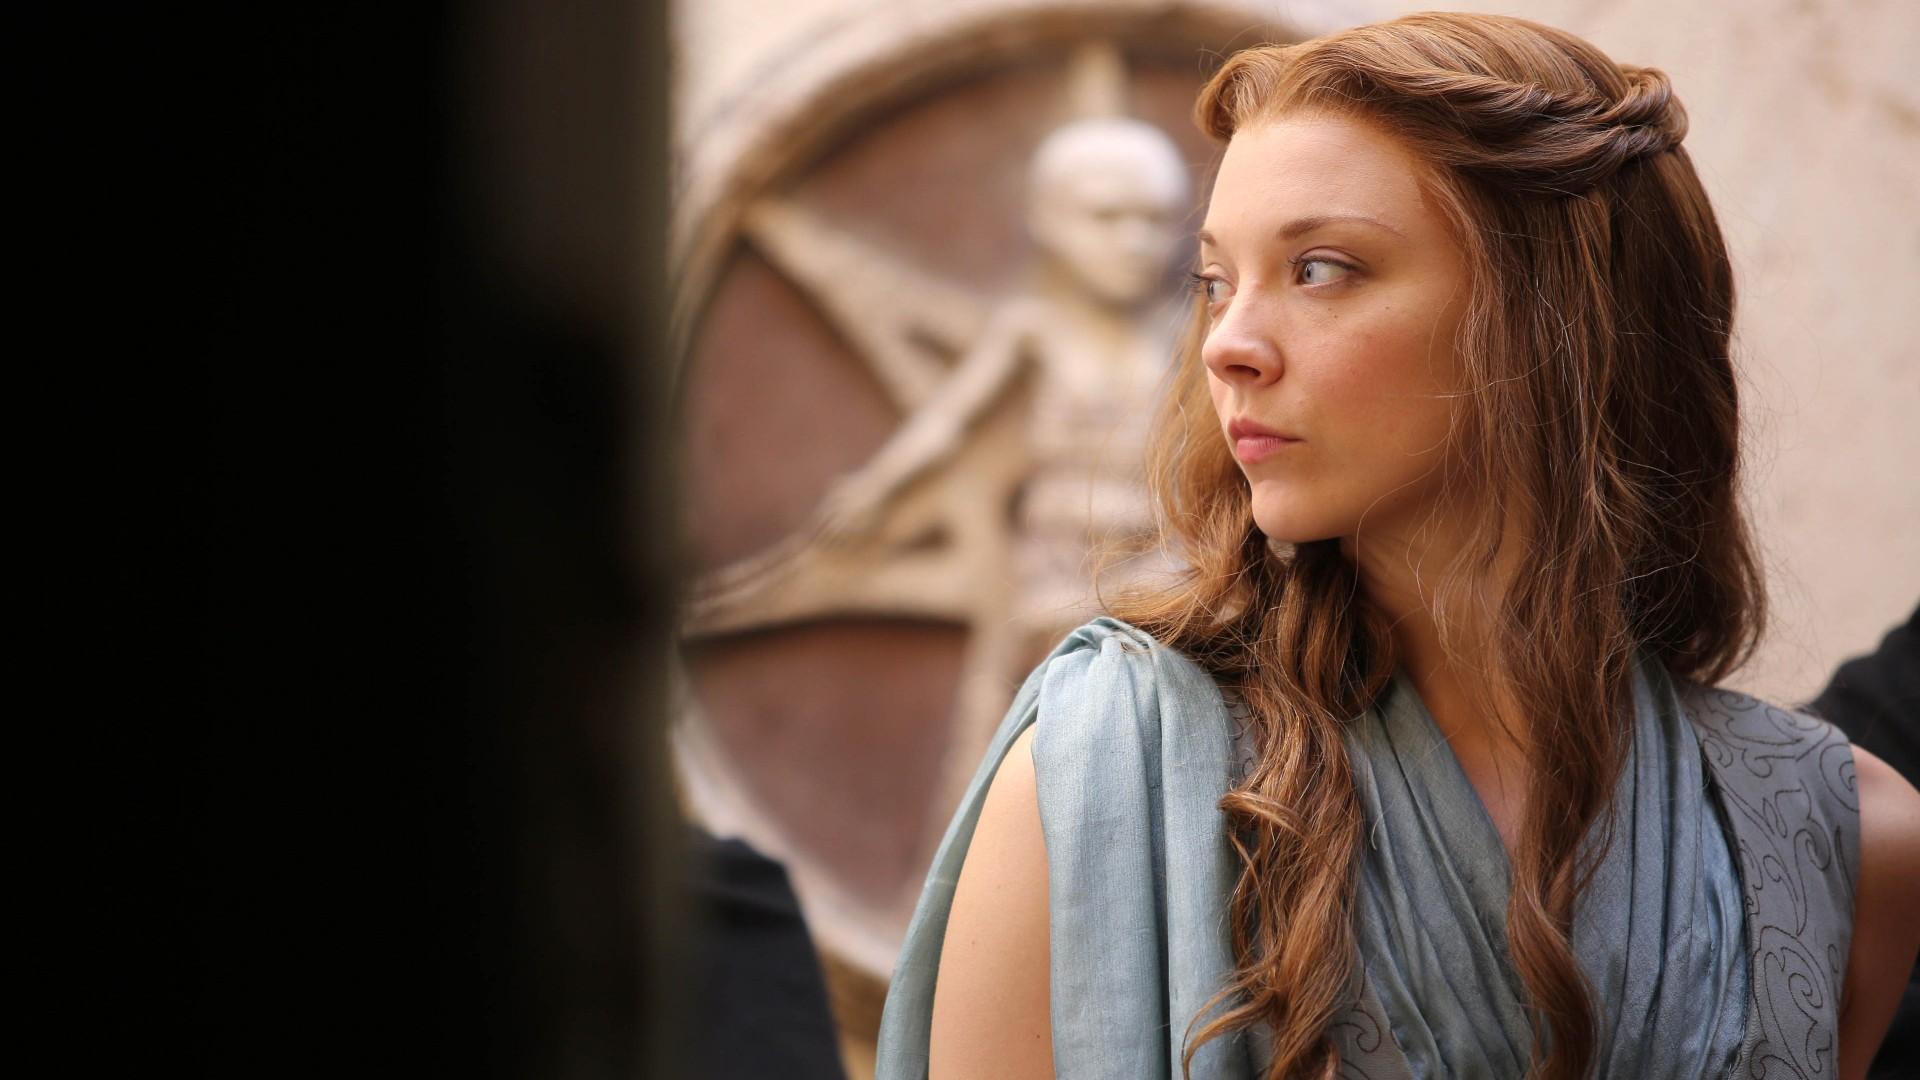 Game Of Thrones Iphone X Wallpaper Natalie Dormer In Game Of Thrones Wallpapers Hd